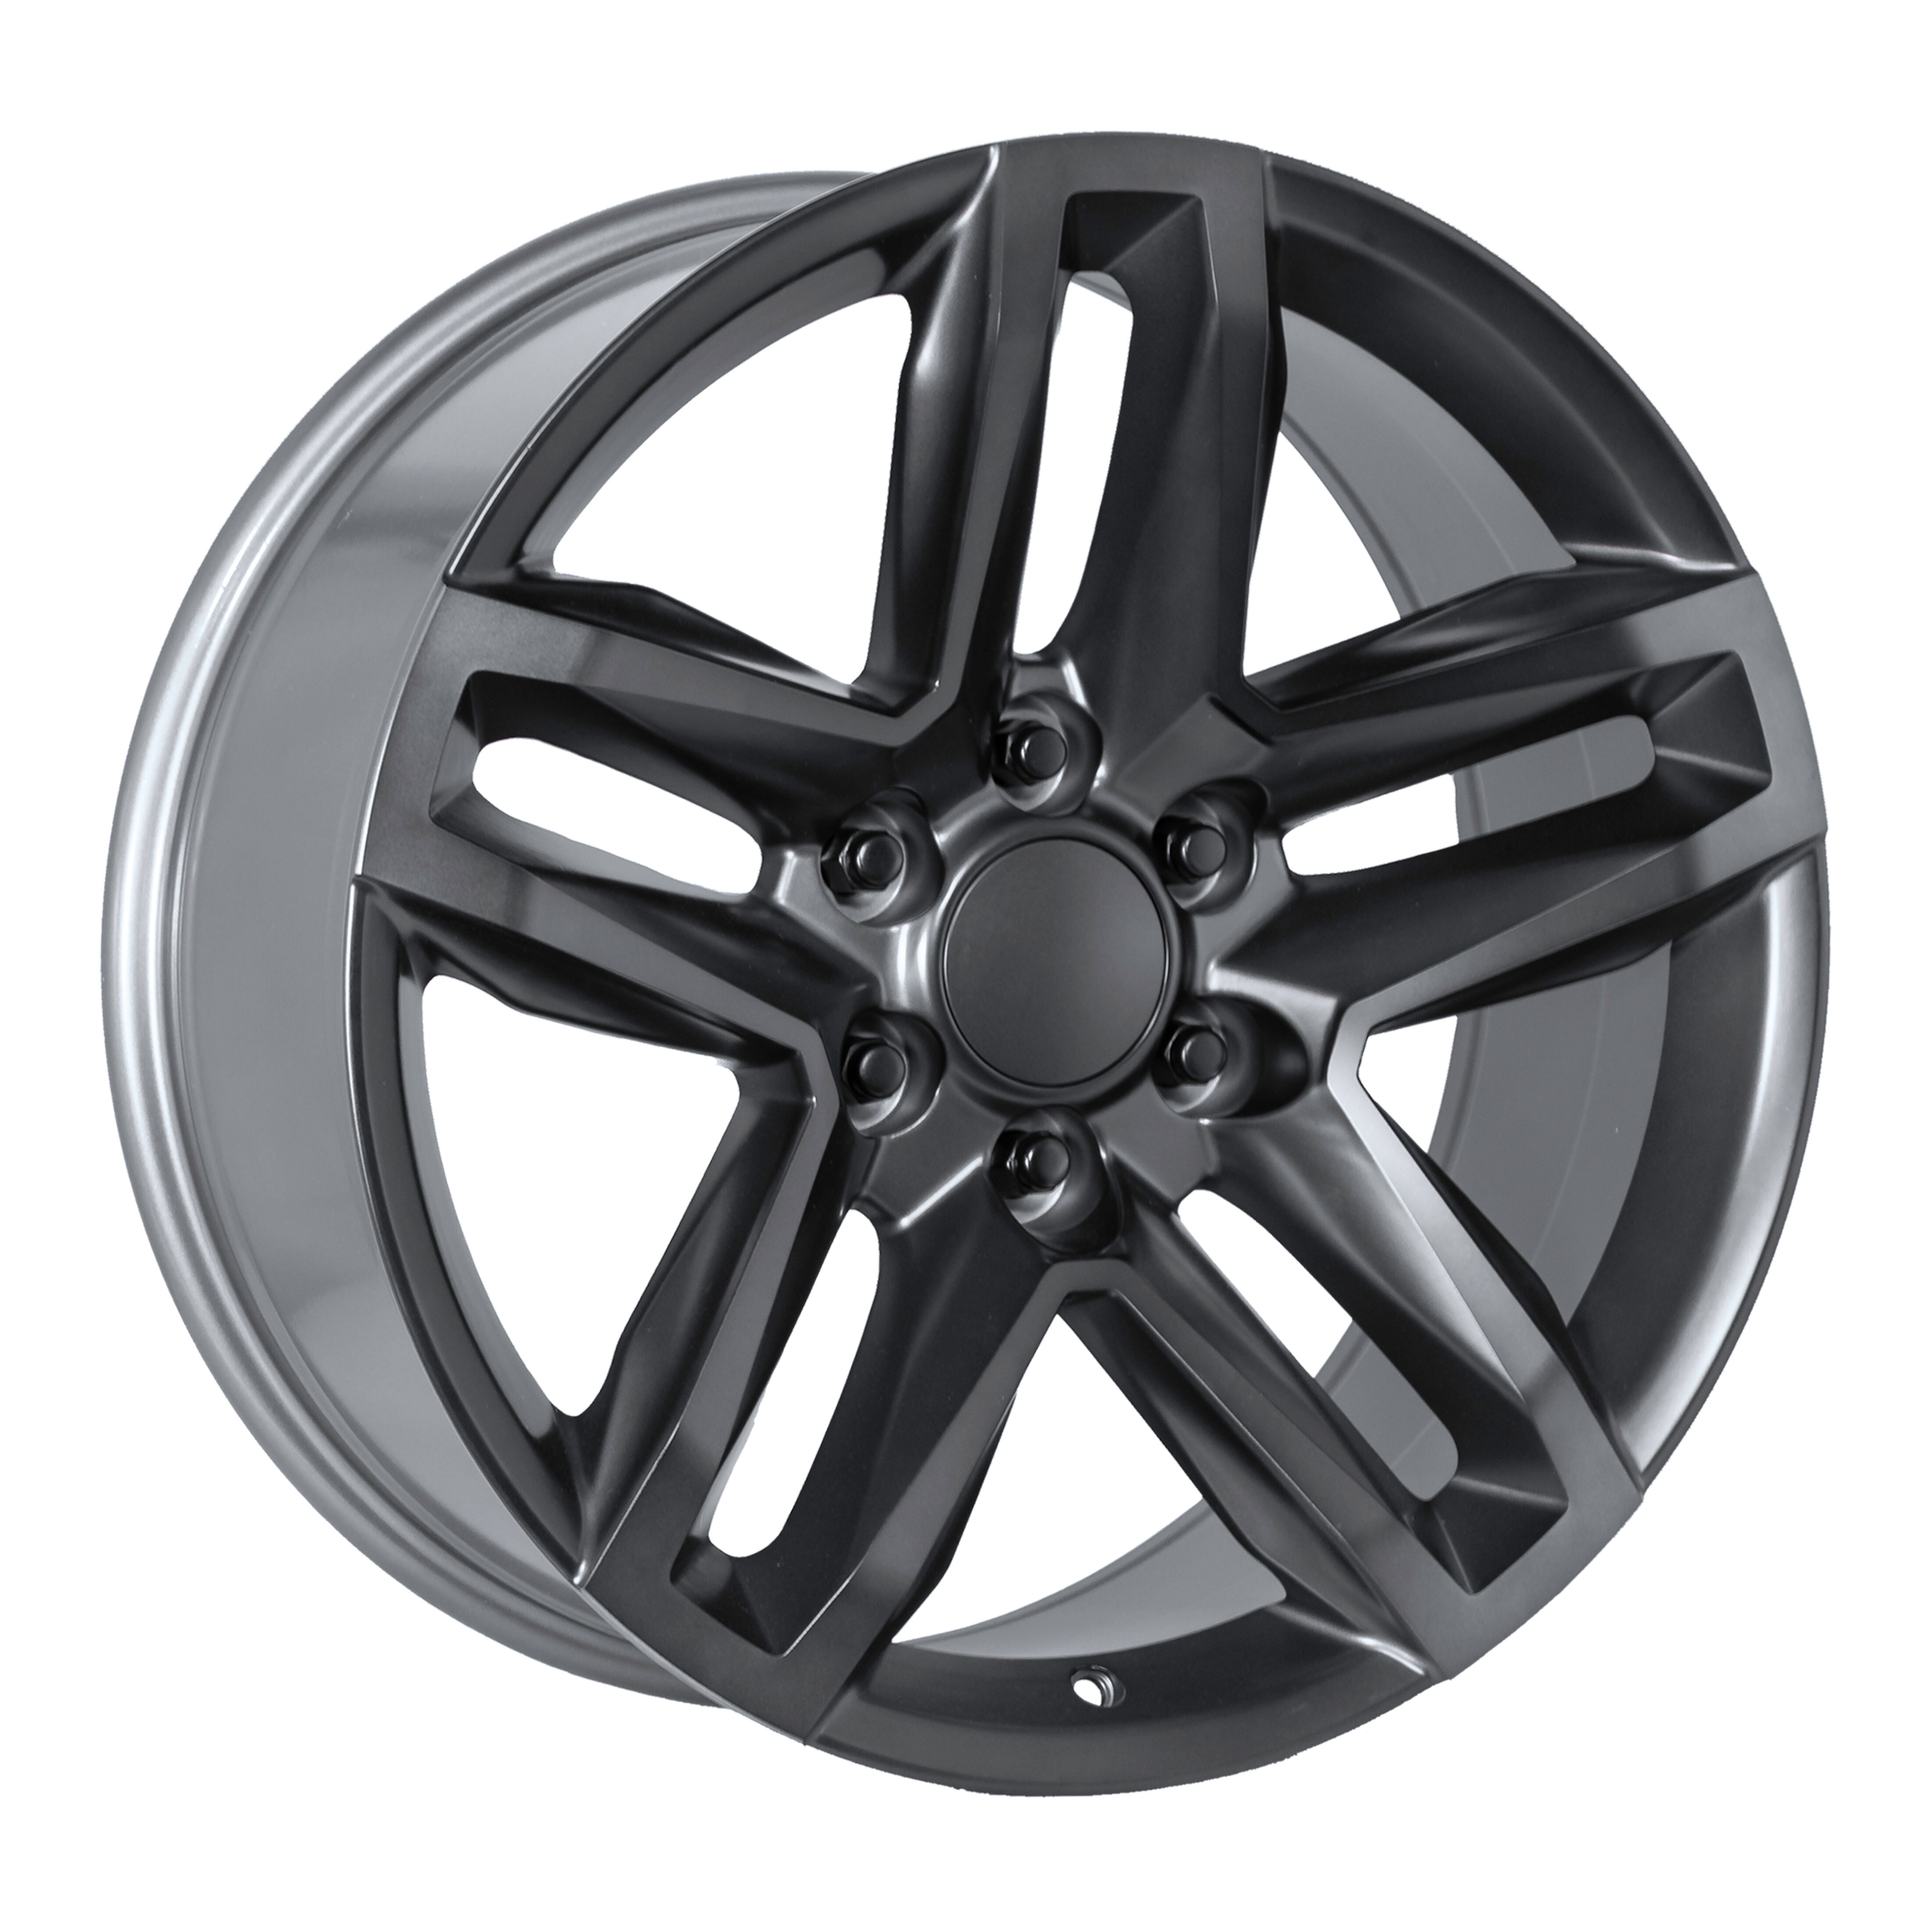 Factory Reproductions Wheels FR94 - Satin Titanium/Dk Grey Rim